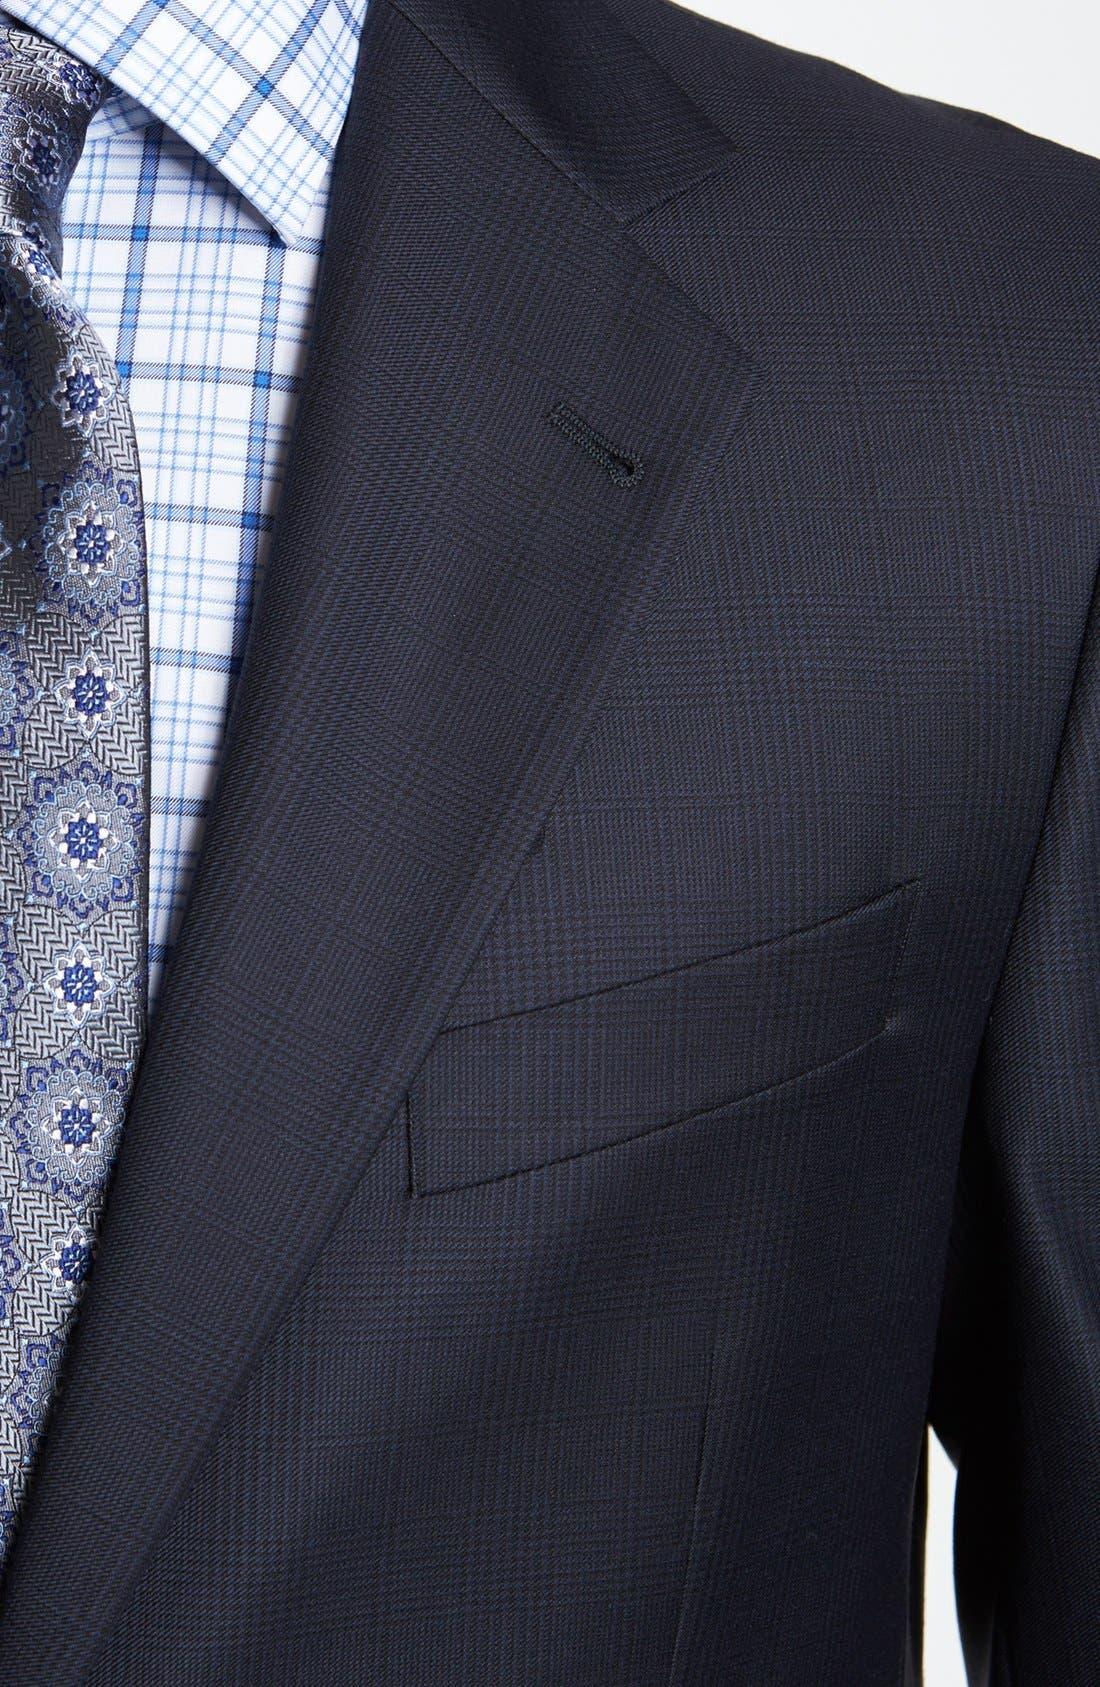 Alternate Image 2  - Joseph Abboud 'Signature Silver' Wool Suit